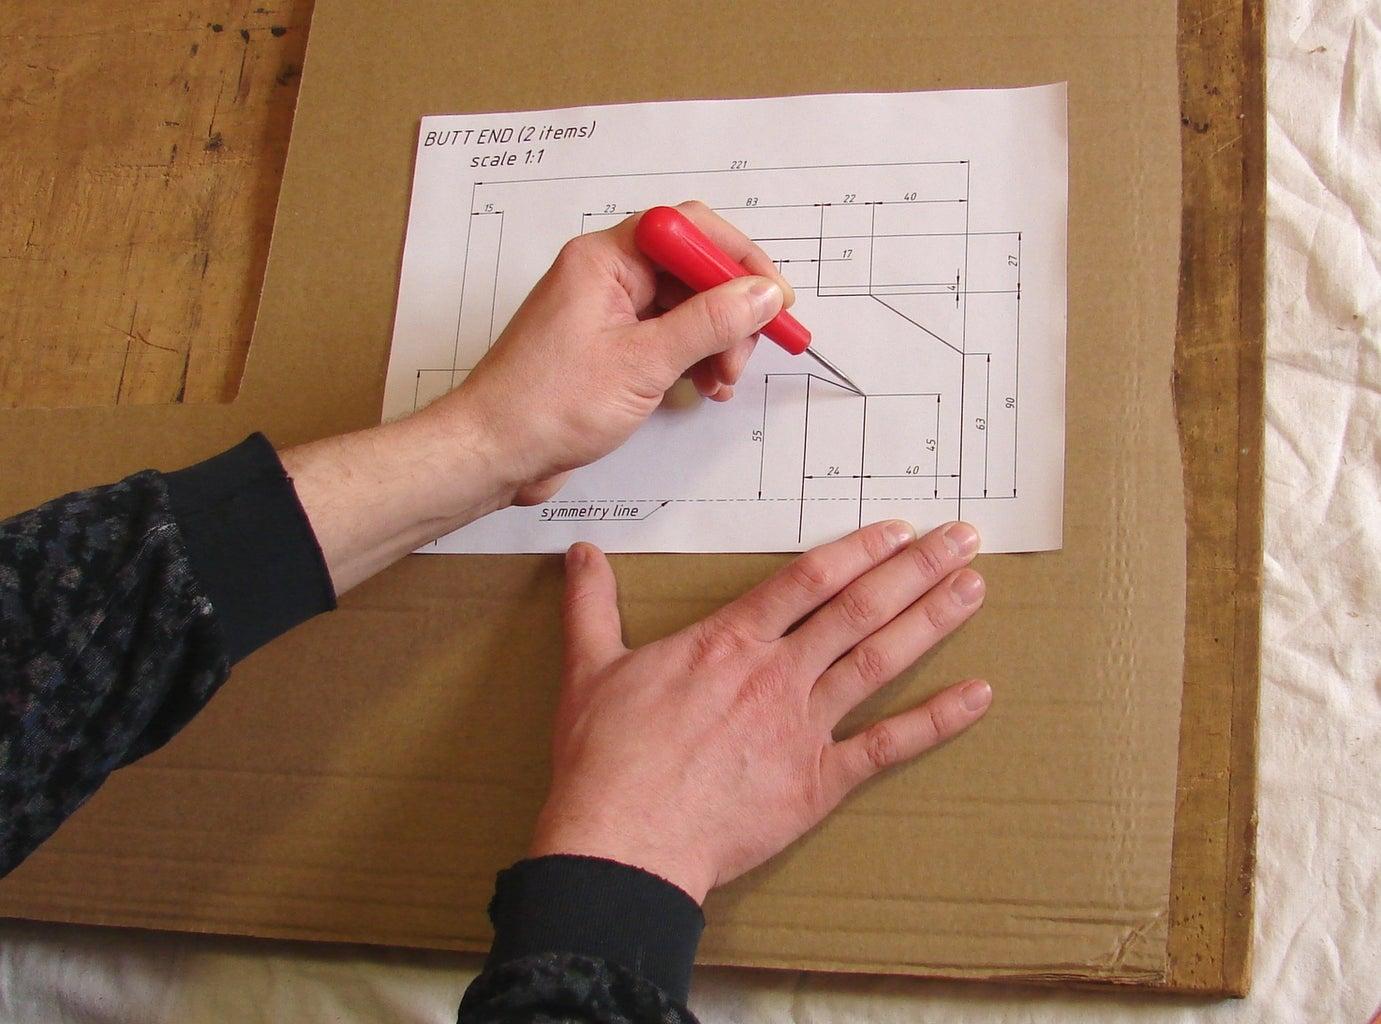 Transferring Drawings to a Cardboard